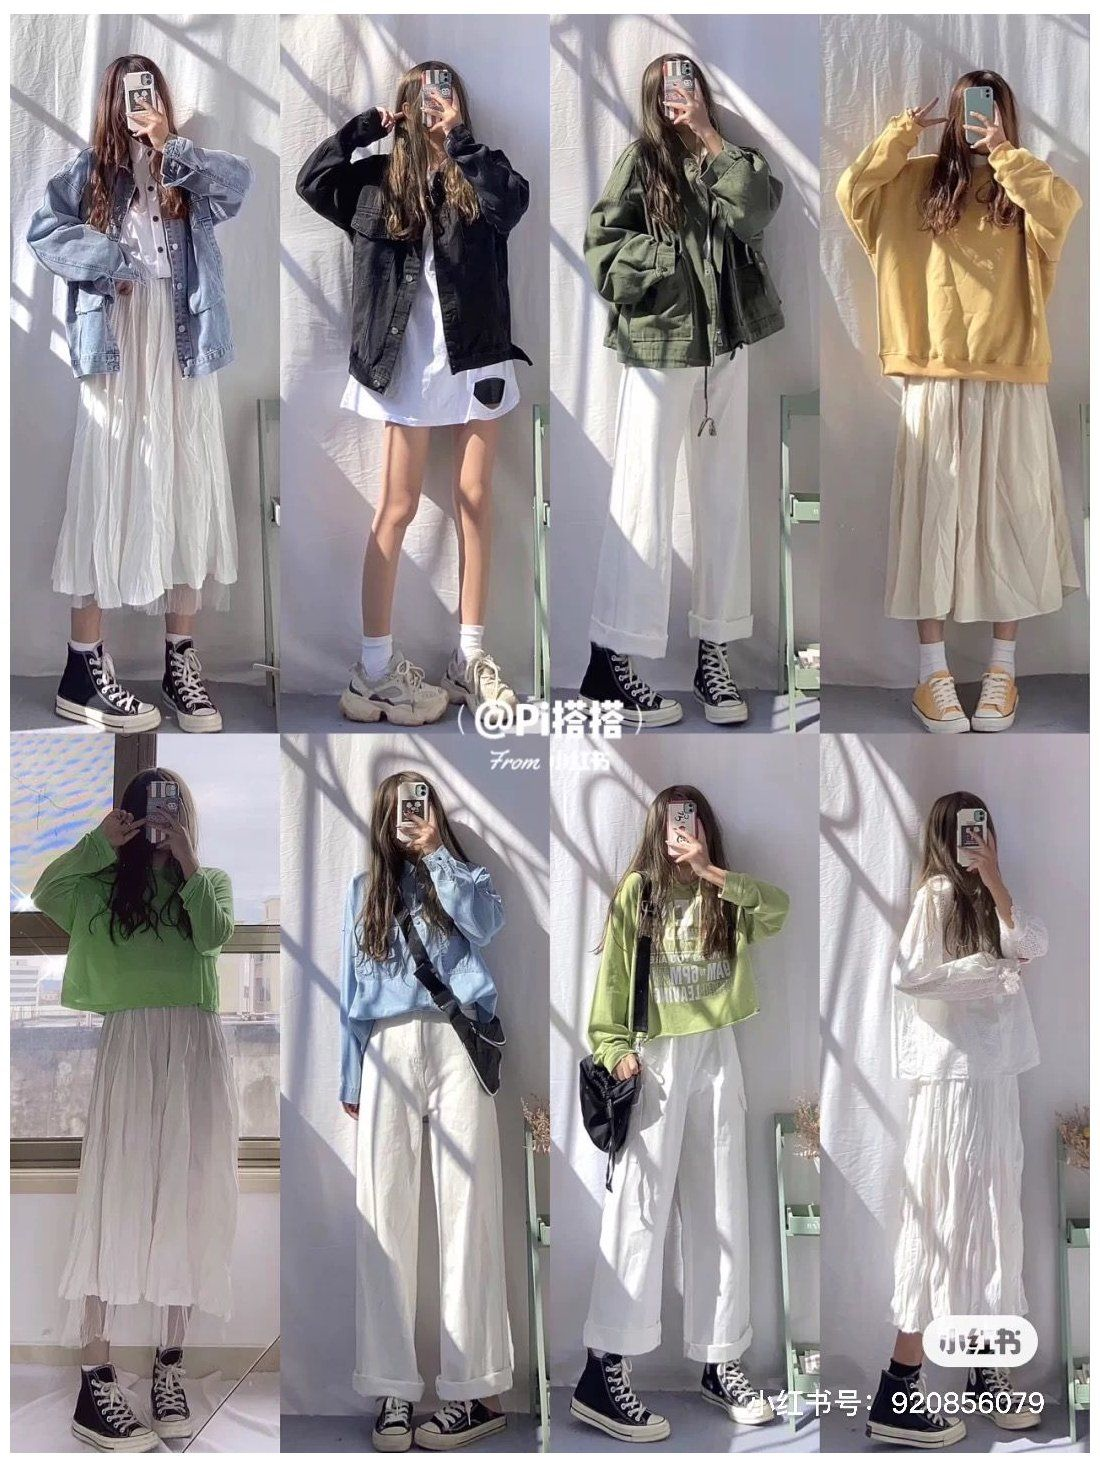 ulzzang #girl #fashion #dress #white #ulzzanggirlfashiondresswhite